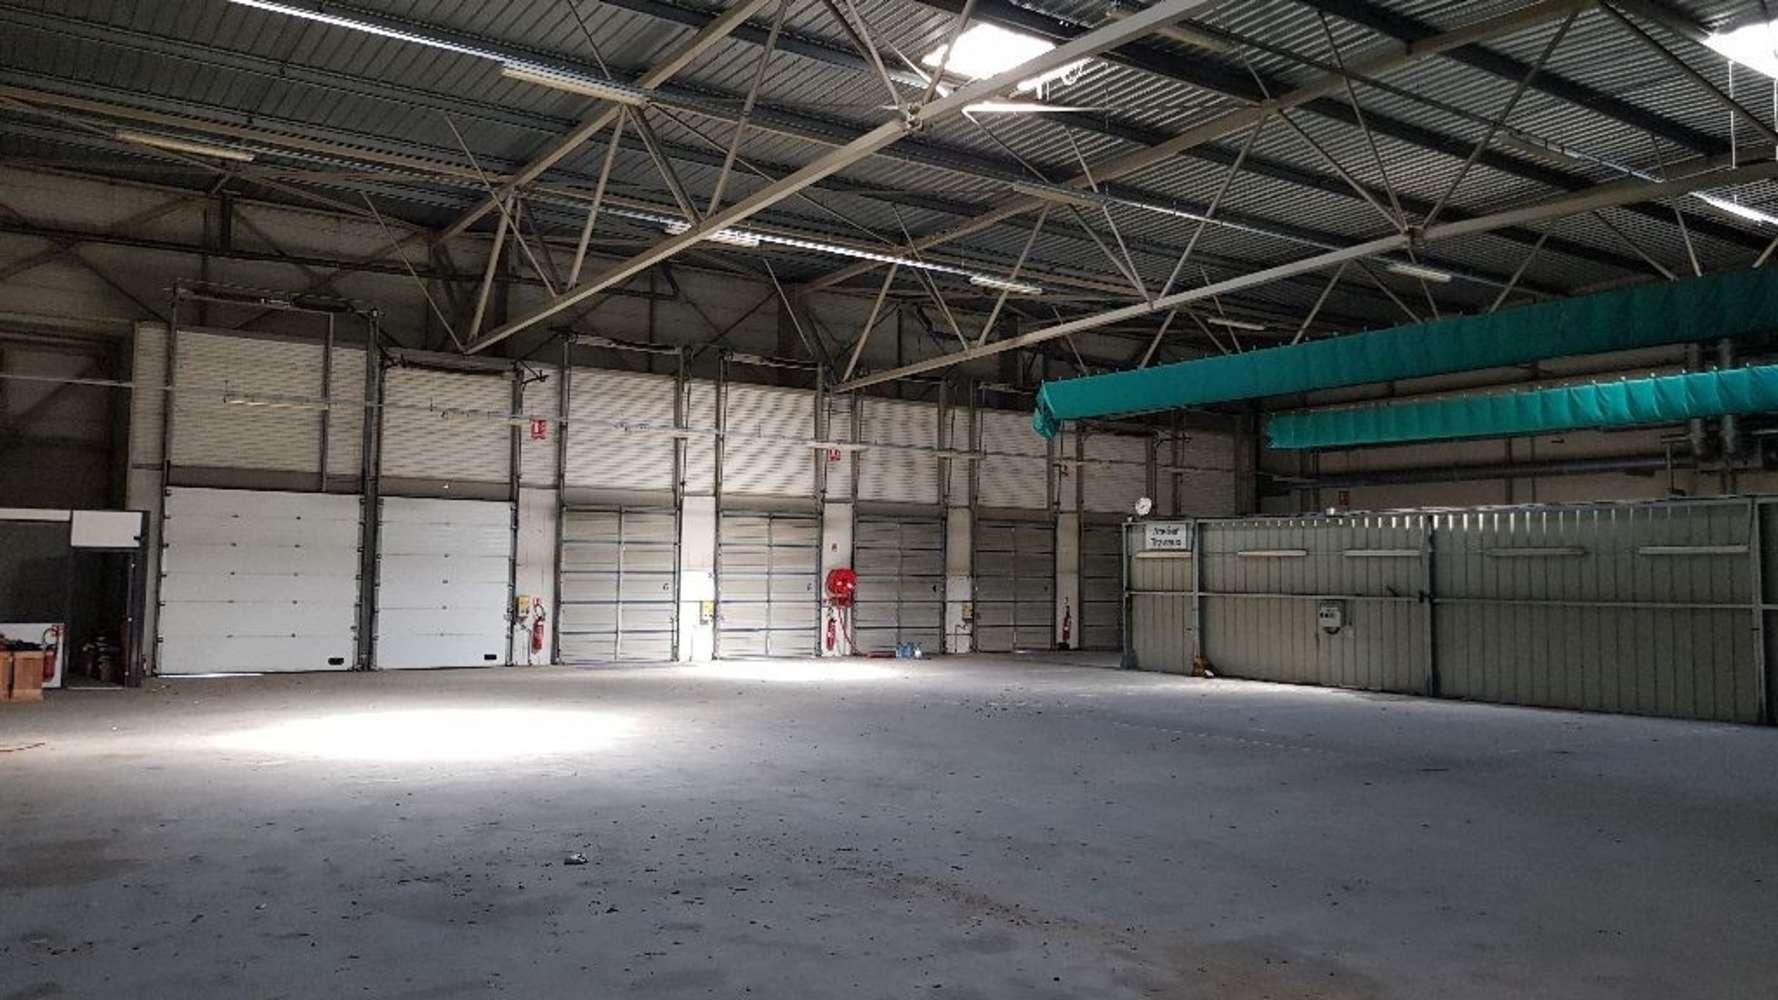 Activités/entrepôt Vaulx milieu, 38090 - Entrepot à vendre Lyon - Vaulx Milieu - 10471420